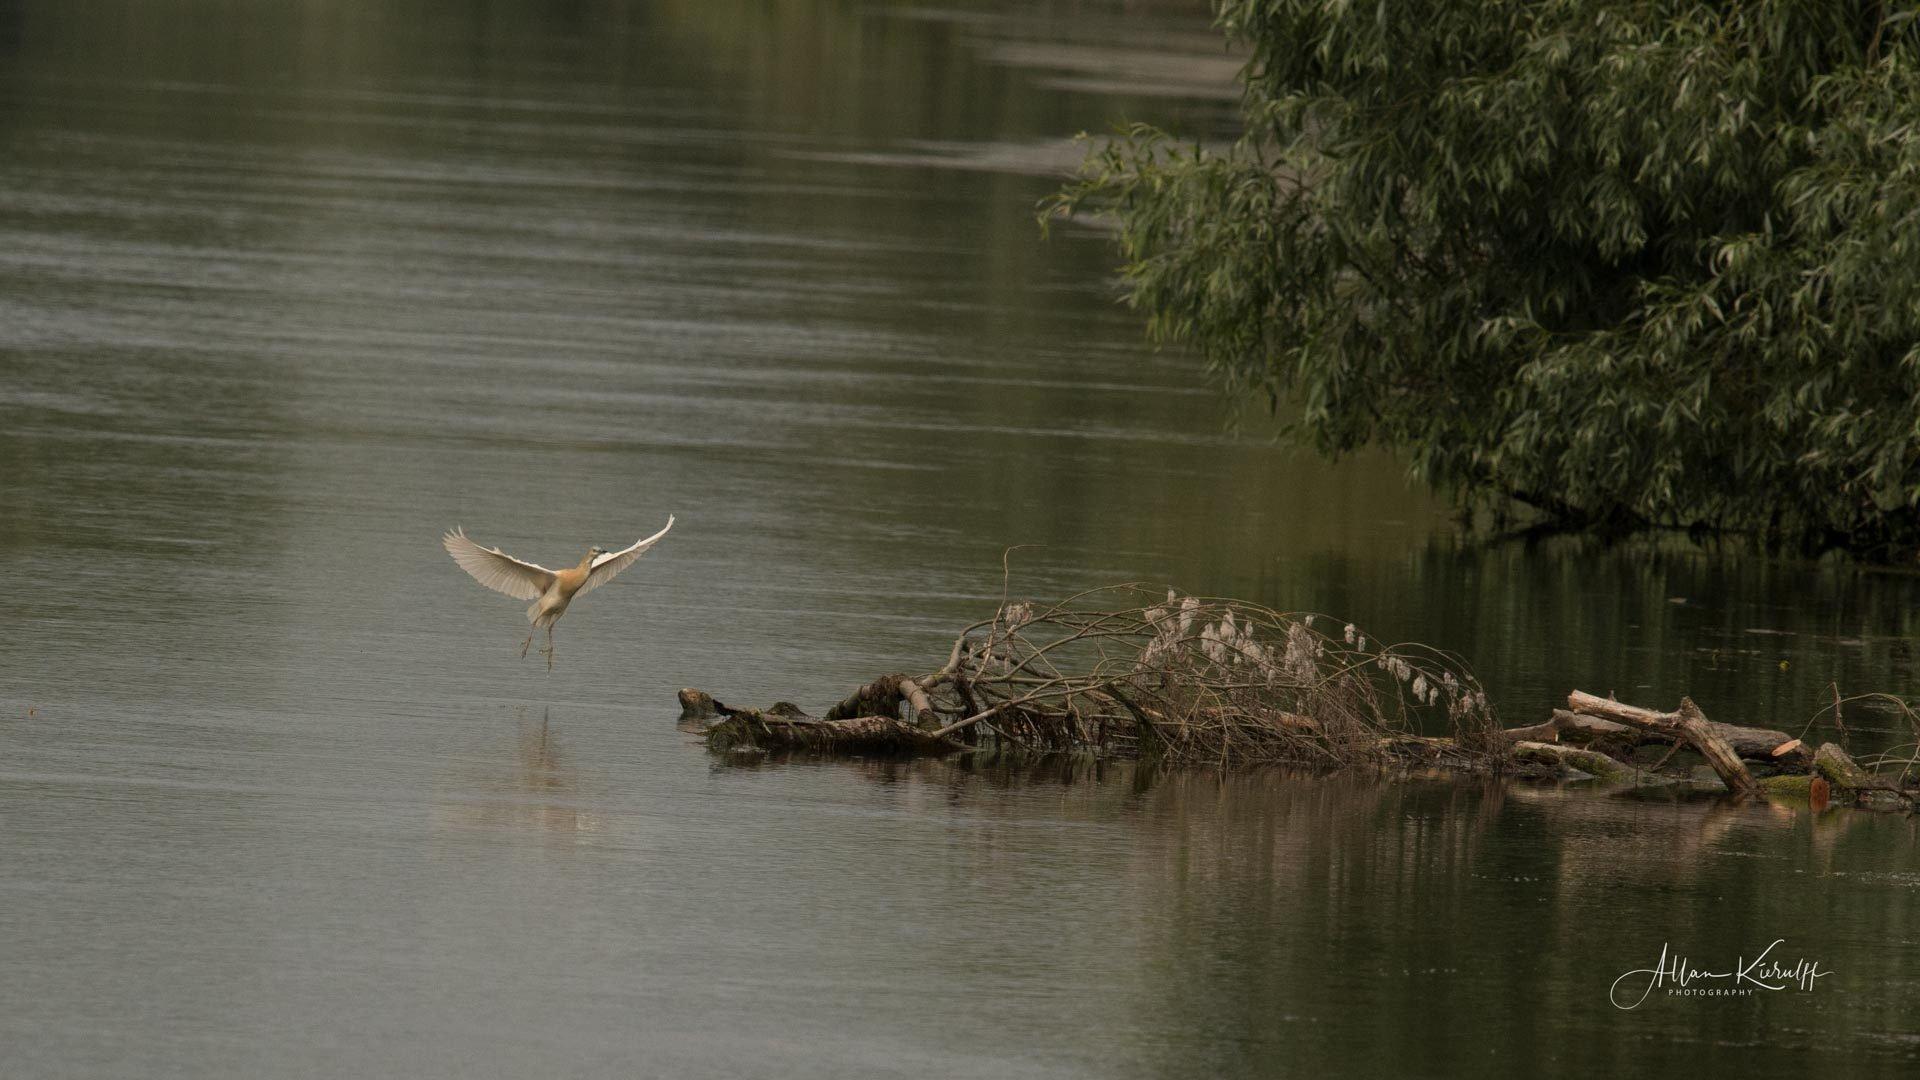 Donau Deltaet 35 4